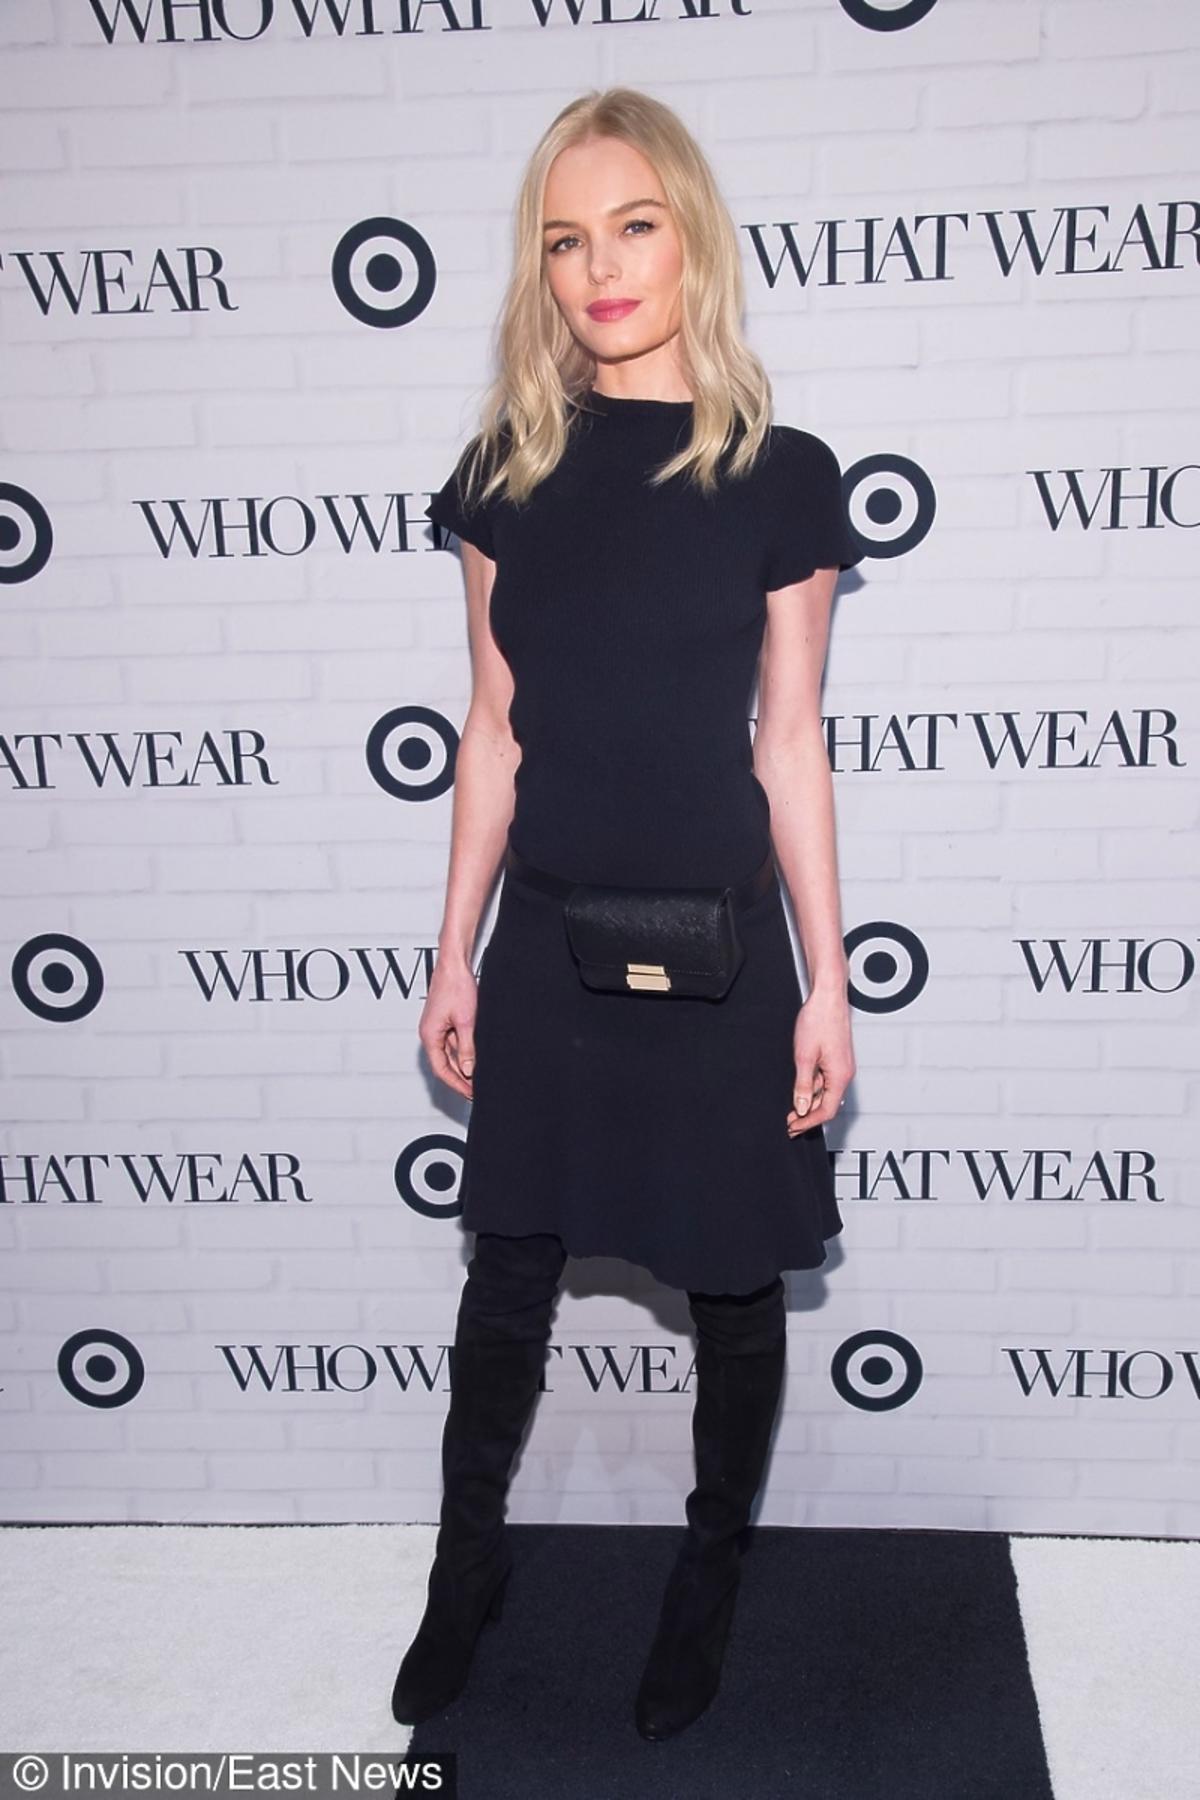 Kate Bosworth wczarnej suknie z czarną torebką na pasku